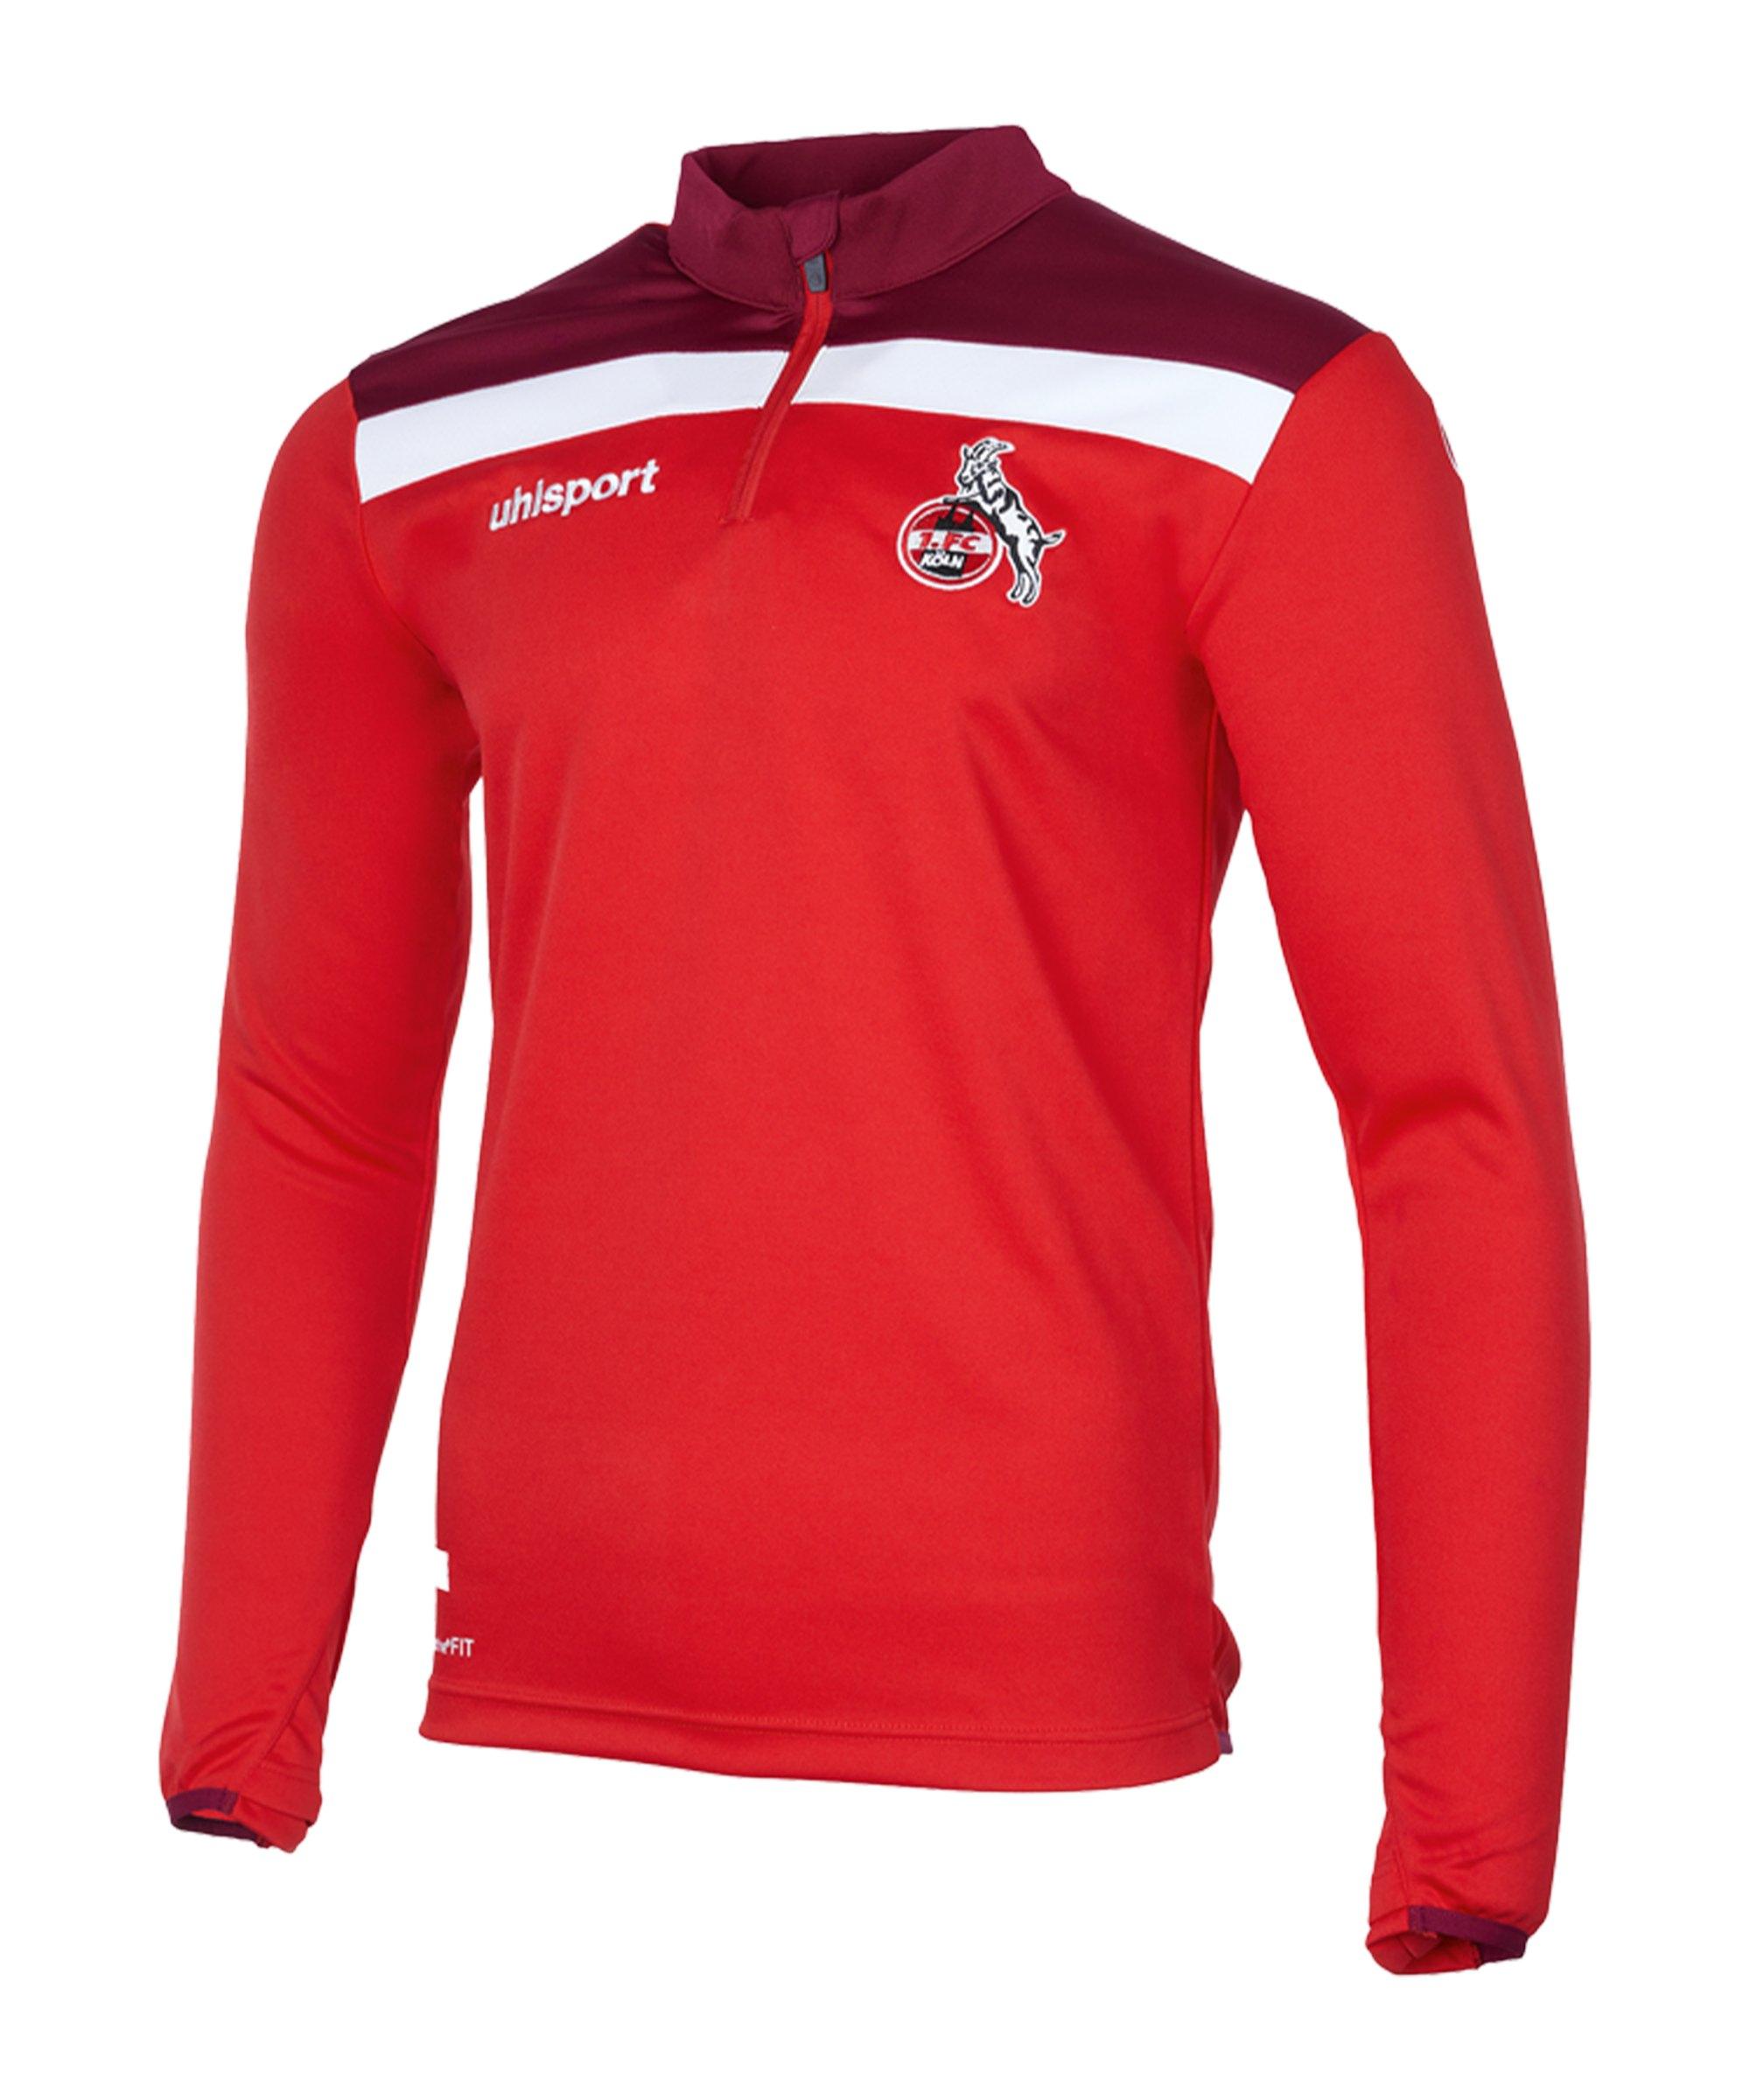 Uhlsport 1. FC Köln Sweatshirt Rot Weiss - rot